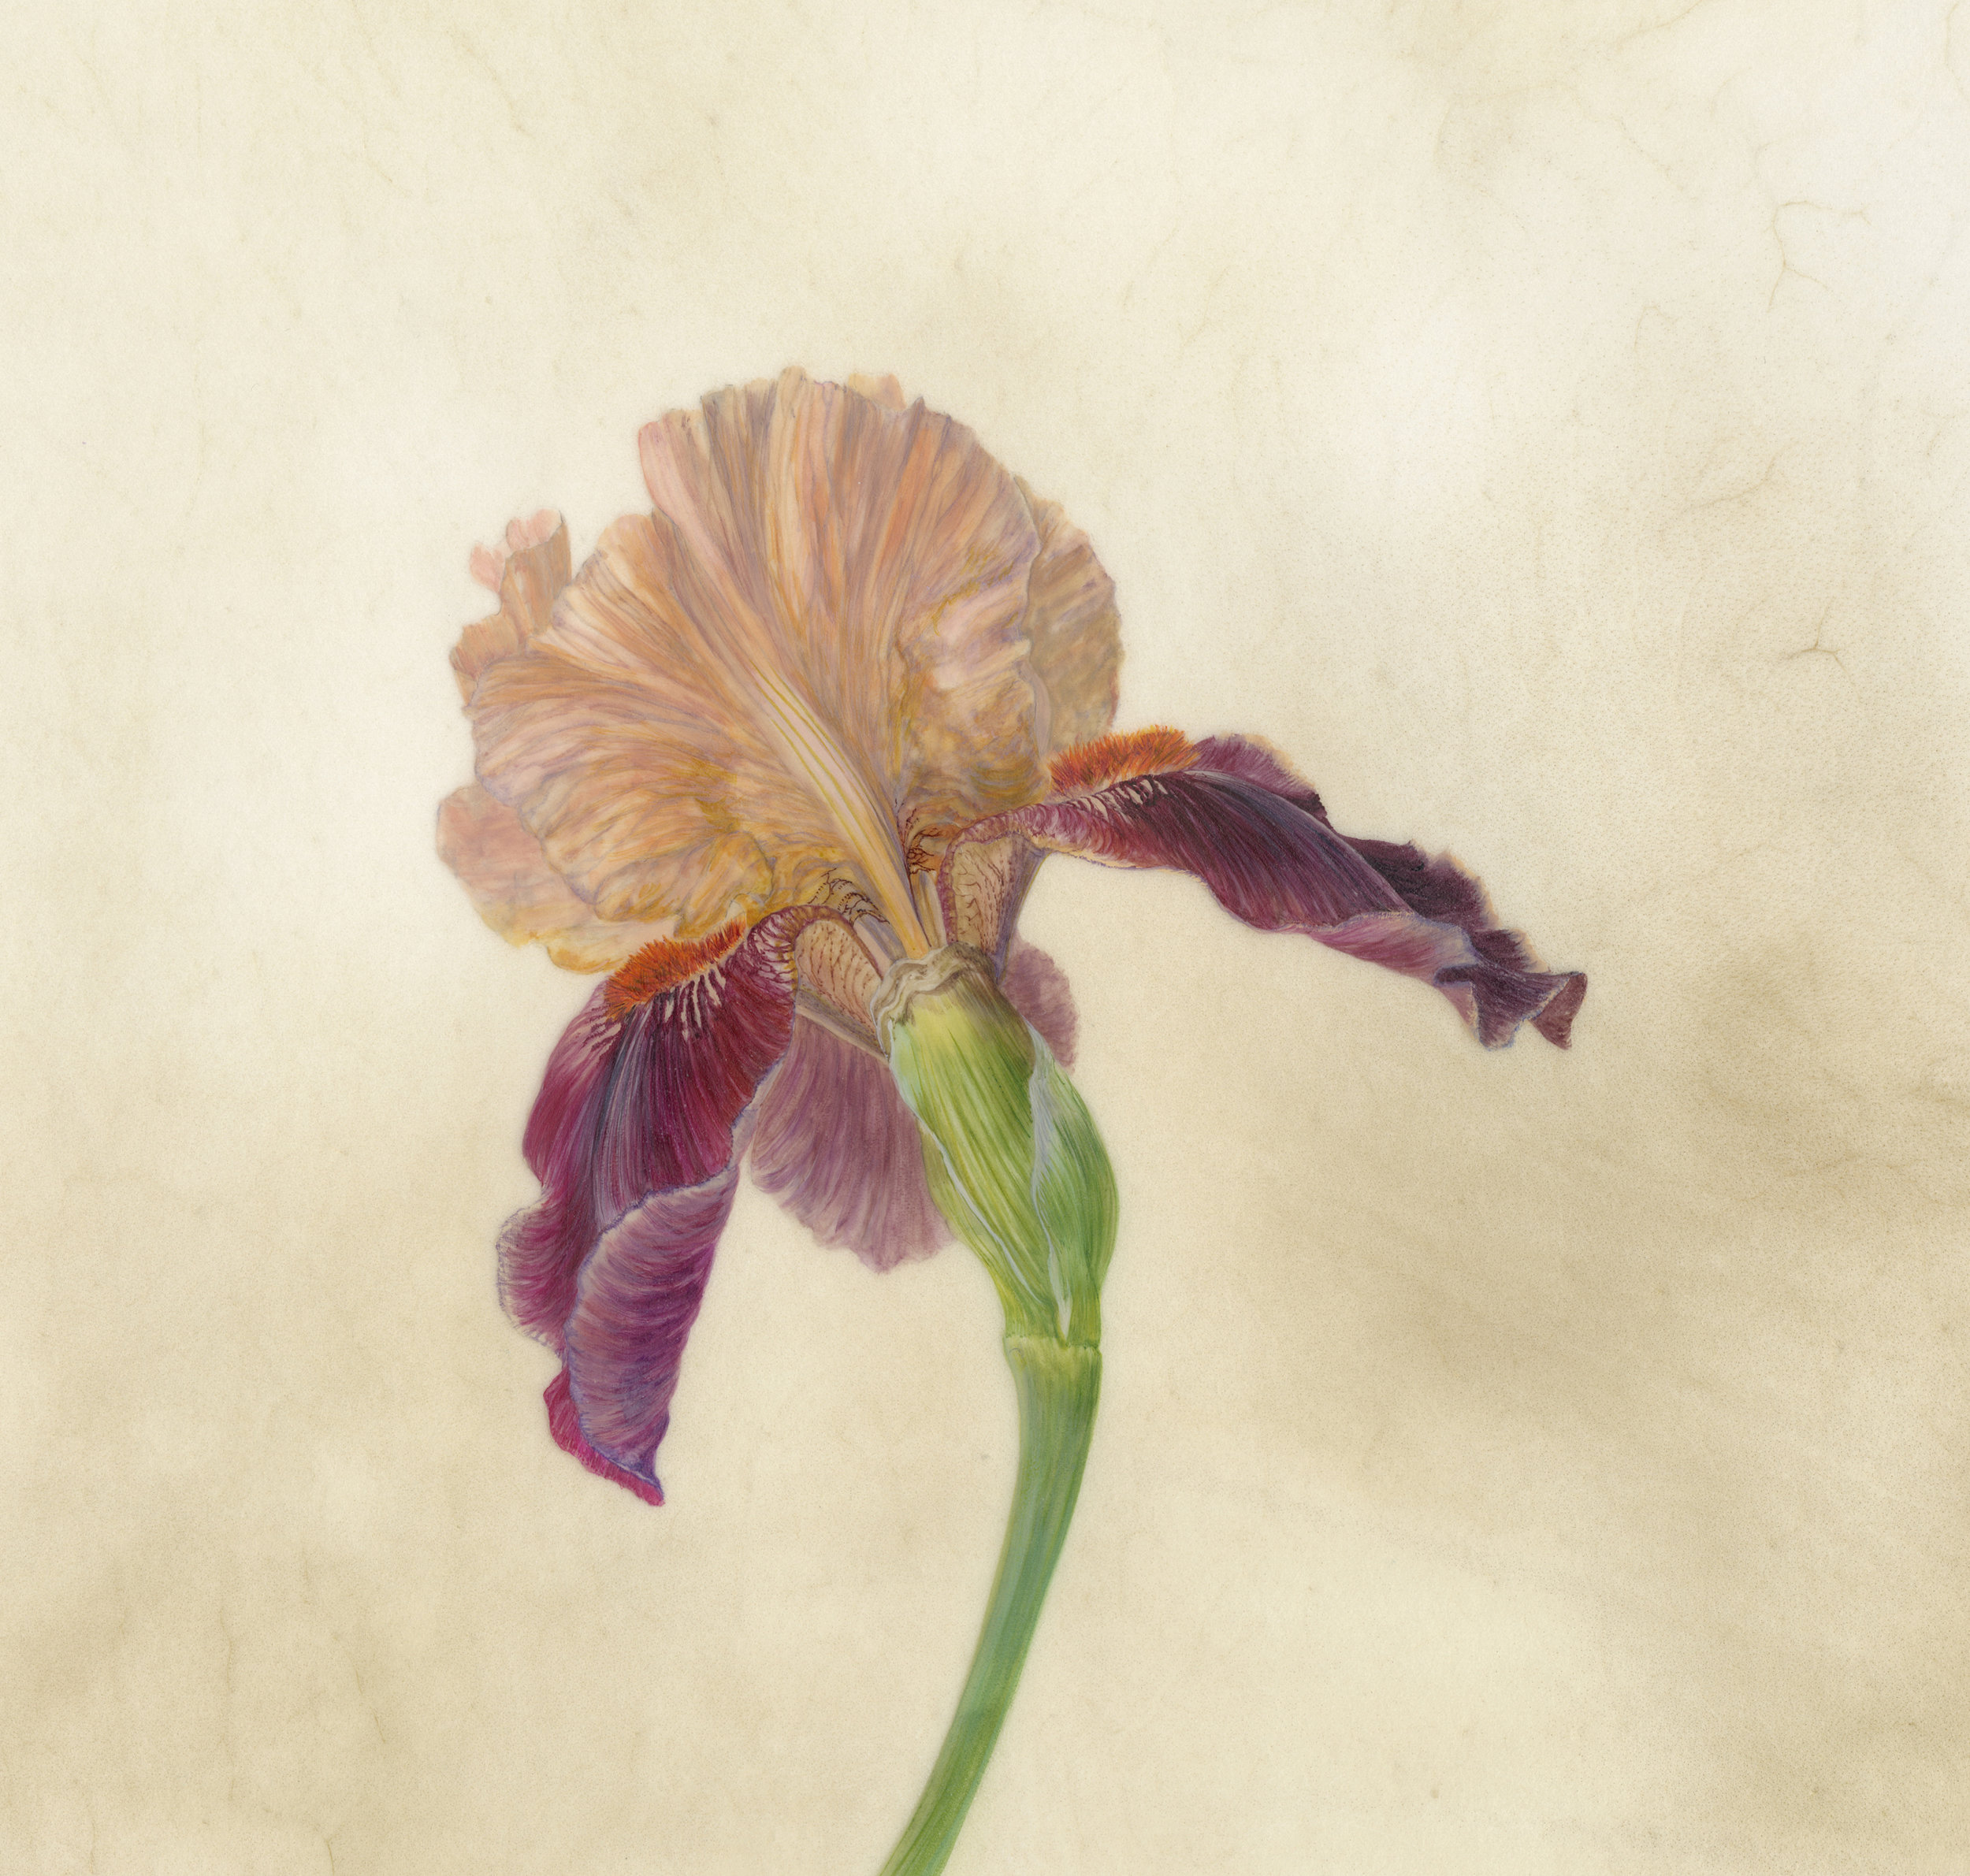 Iris Recogniton III Cimarron Strip  watercolour on vellum  21 x 21 cm image  45 x 45 cm framed  £720